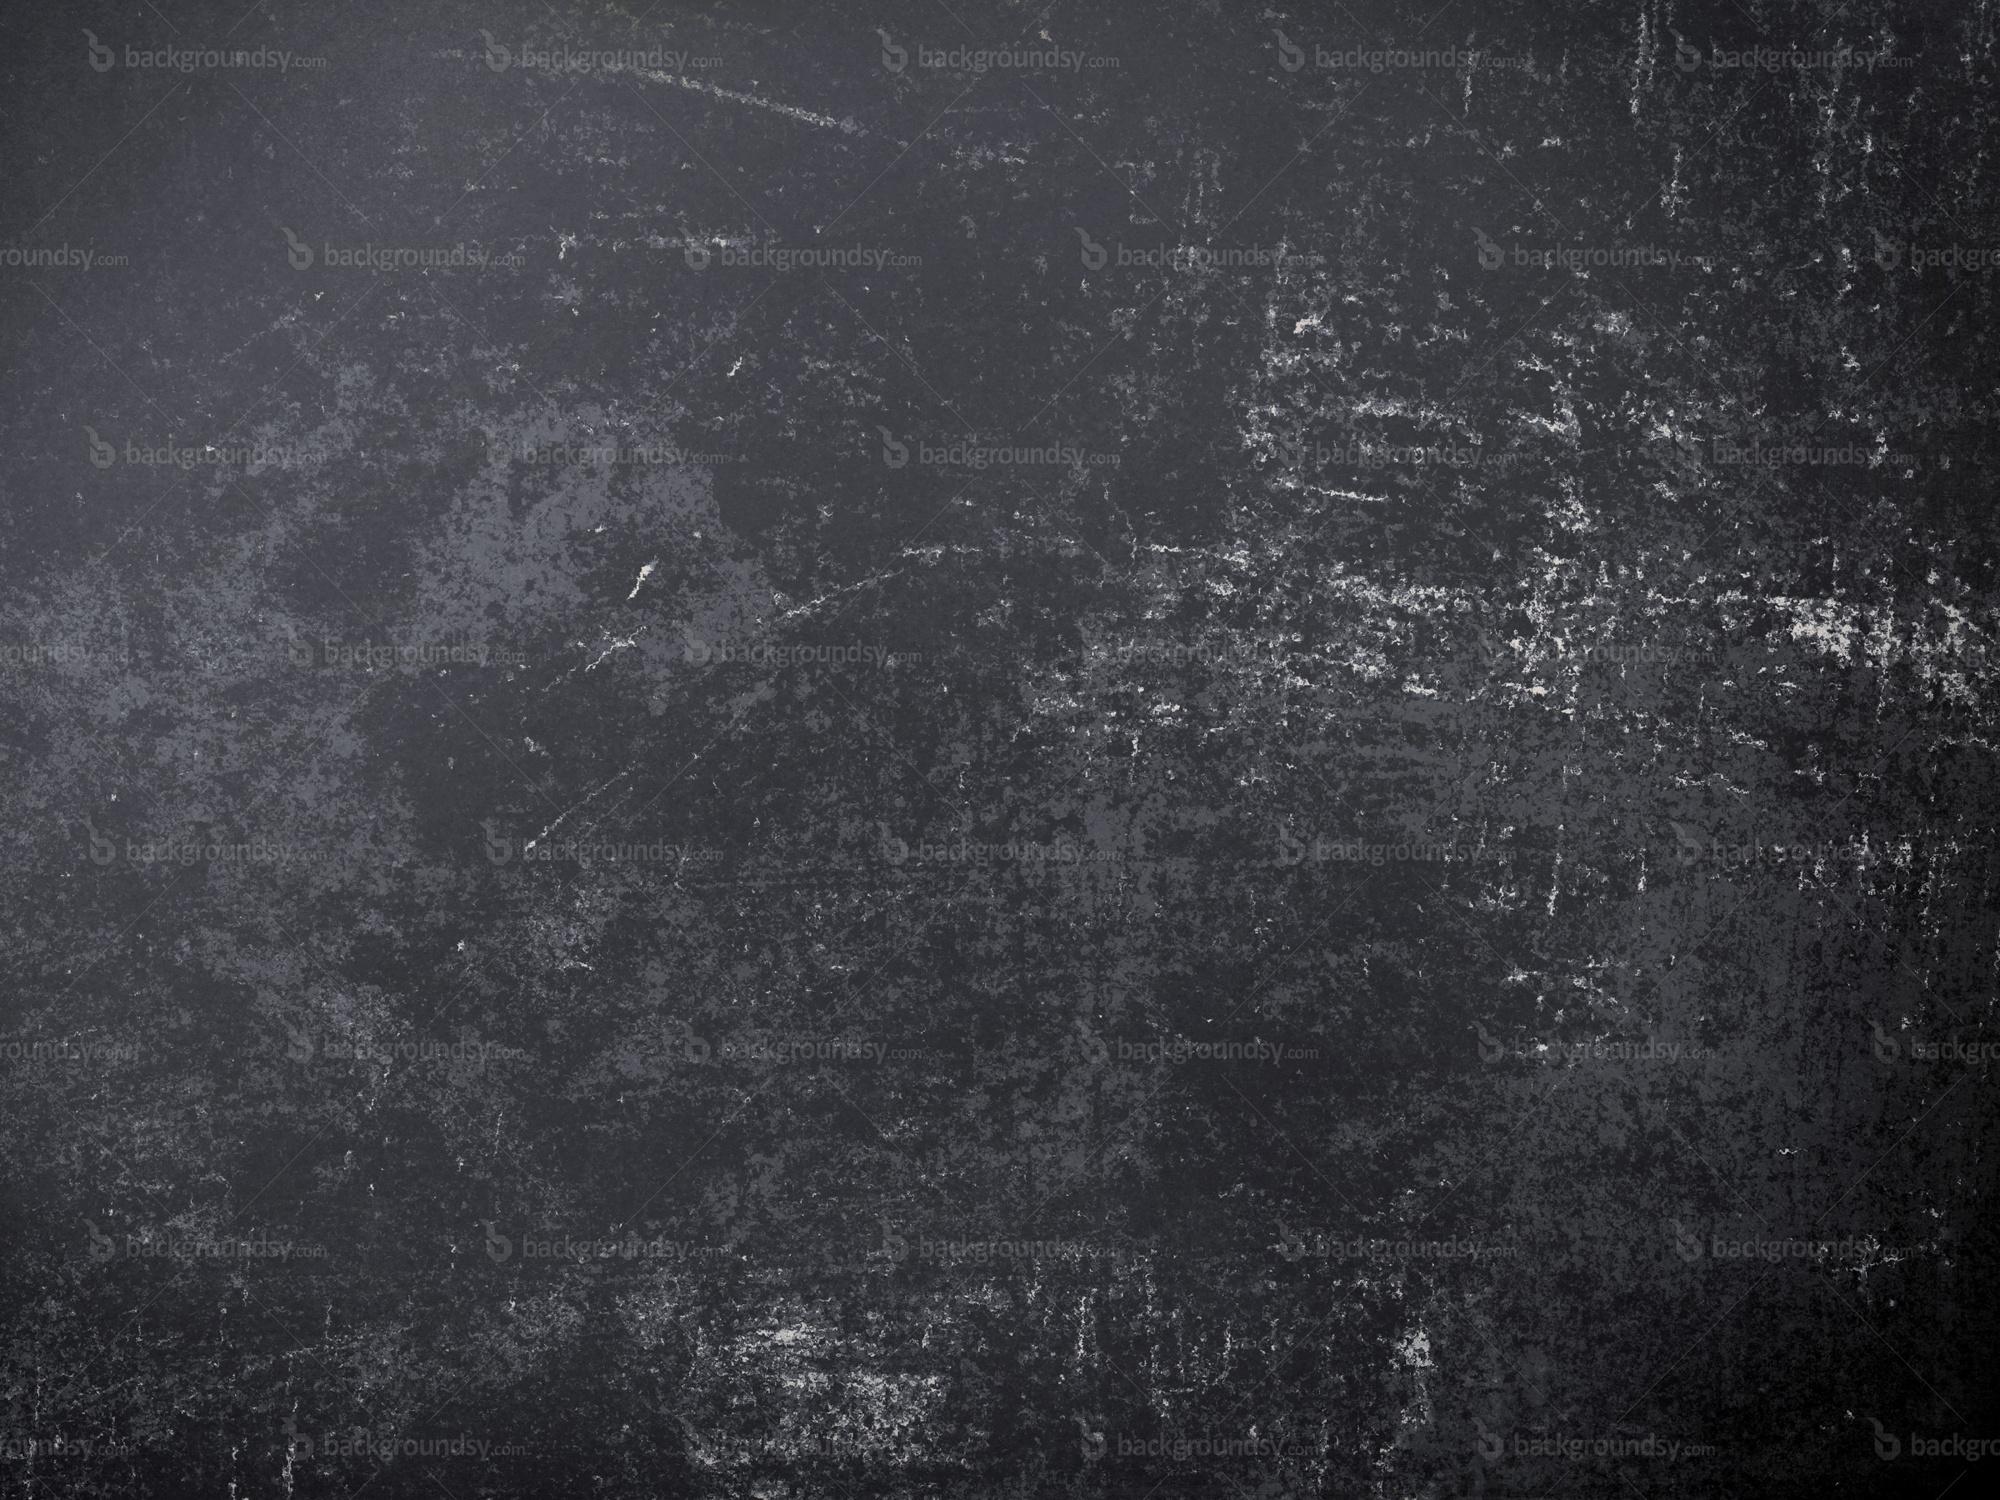 Dark Grunge Wall Backgroundsy Com